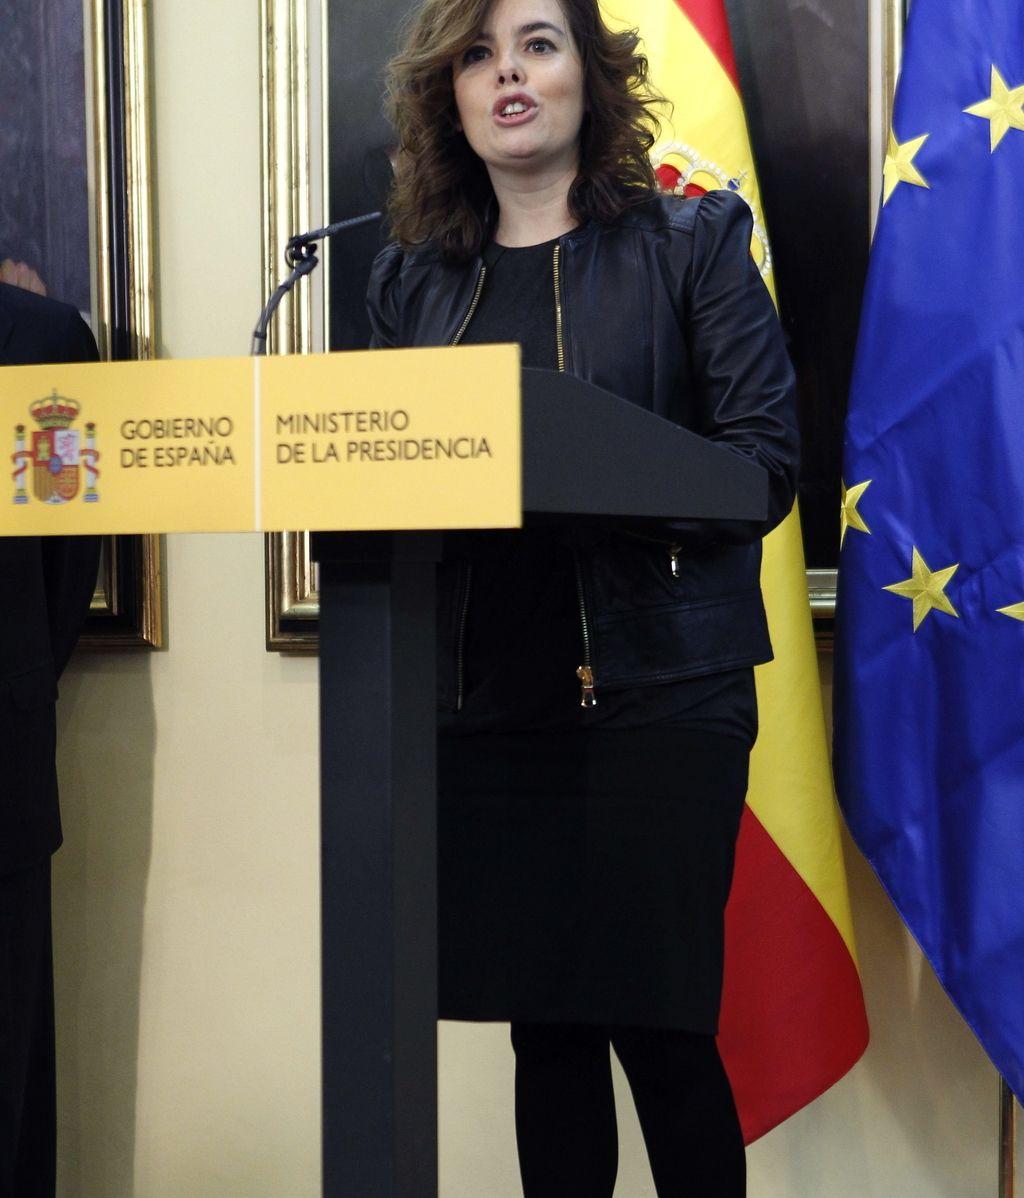 Soraya Saénz de Santamaría preside en Moncloa la toma de posesión de dos secretarios de Estado